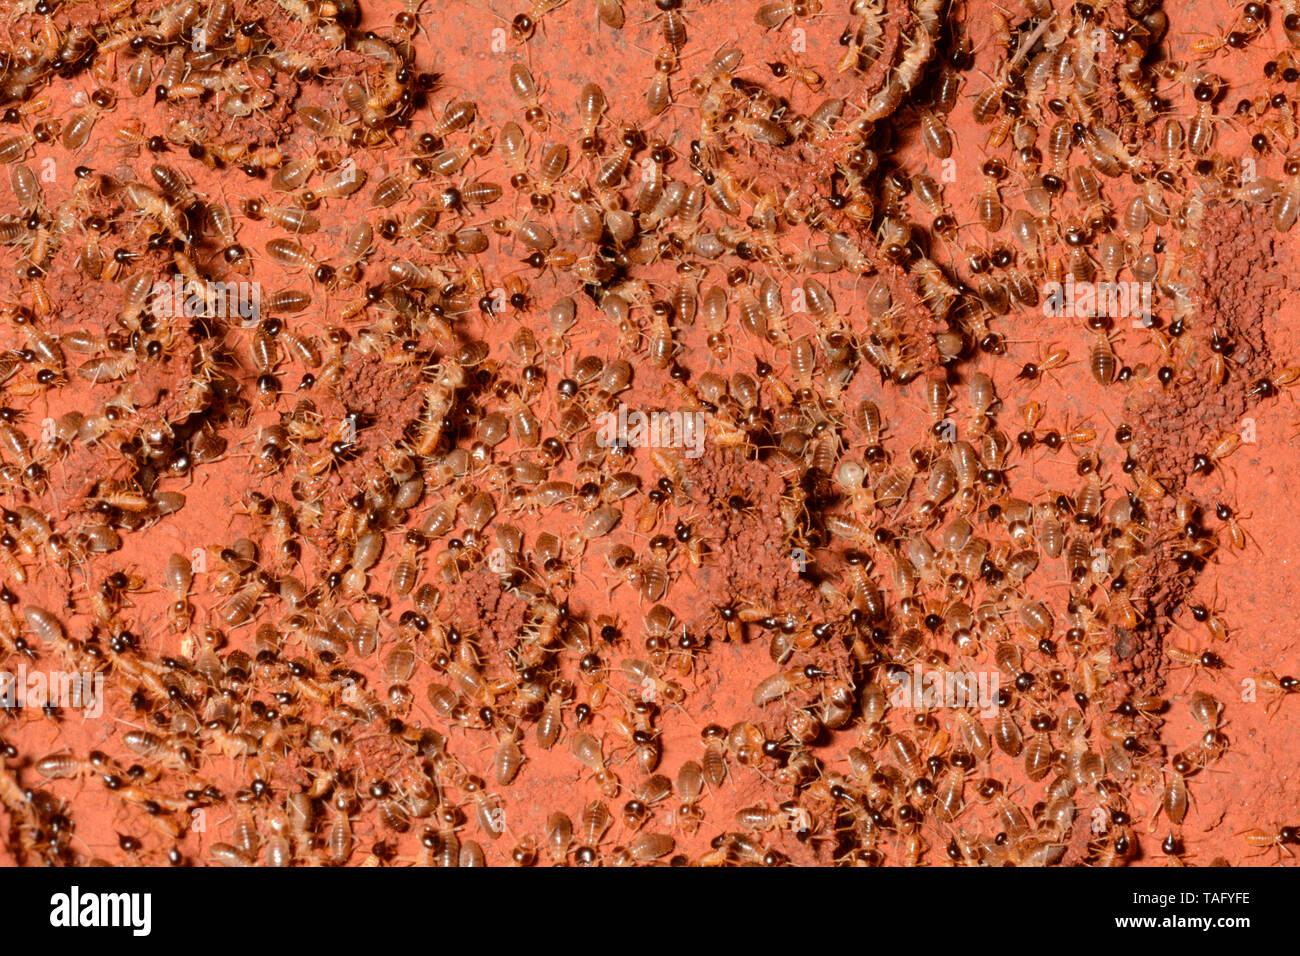 Termites (Isoptera sp), Karijini National Park, WA, Australia - Stock Image